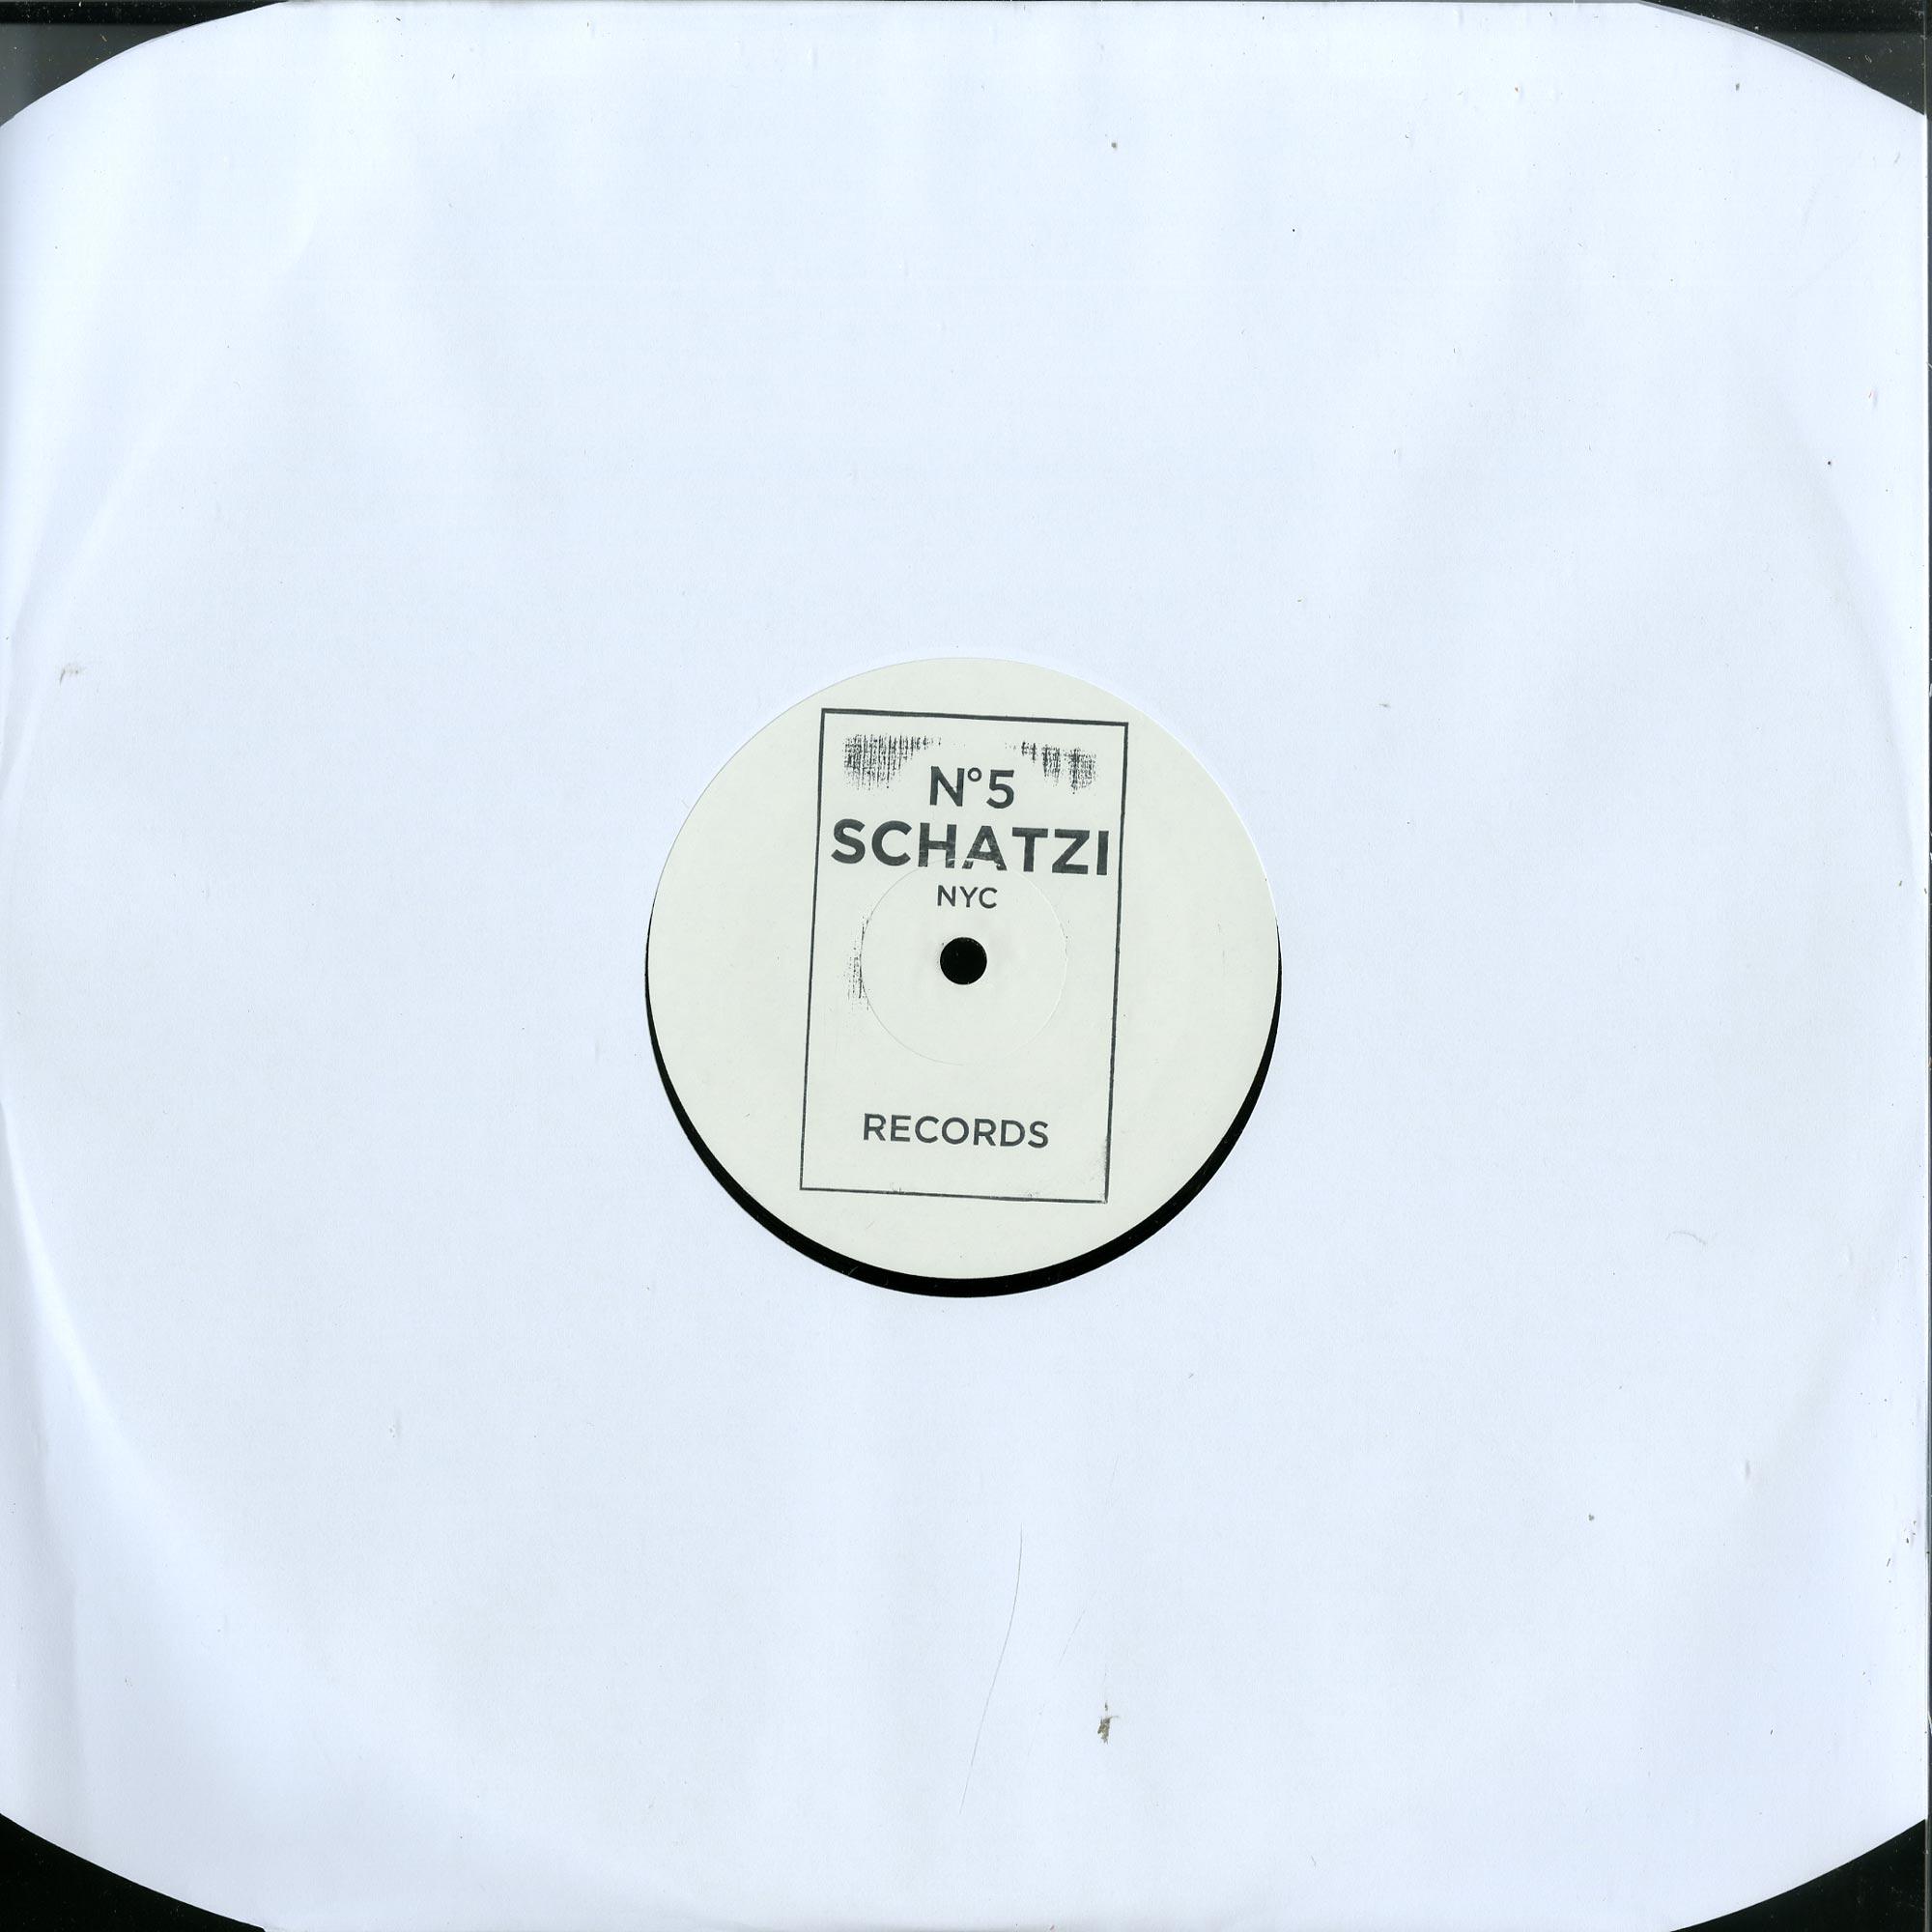 Schatzi - SCHATZI05 EP